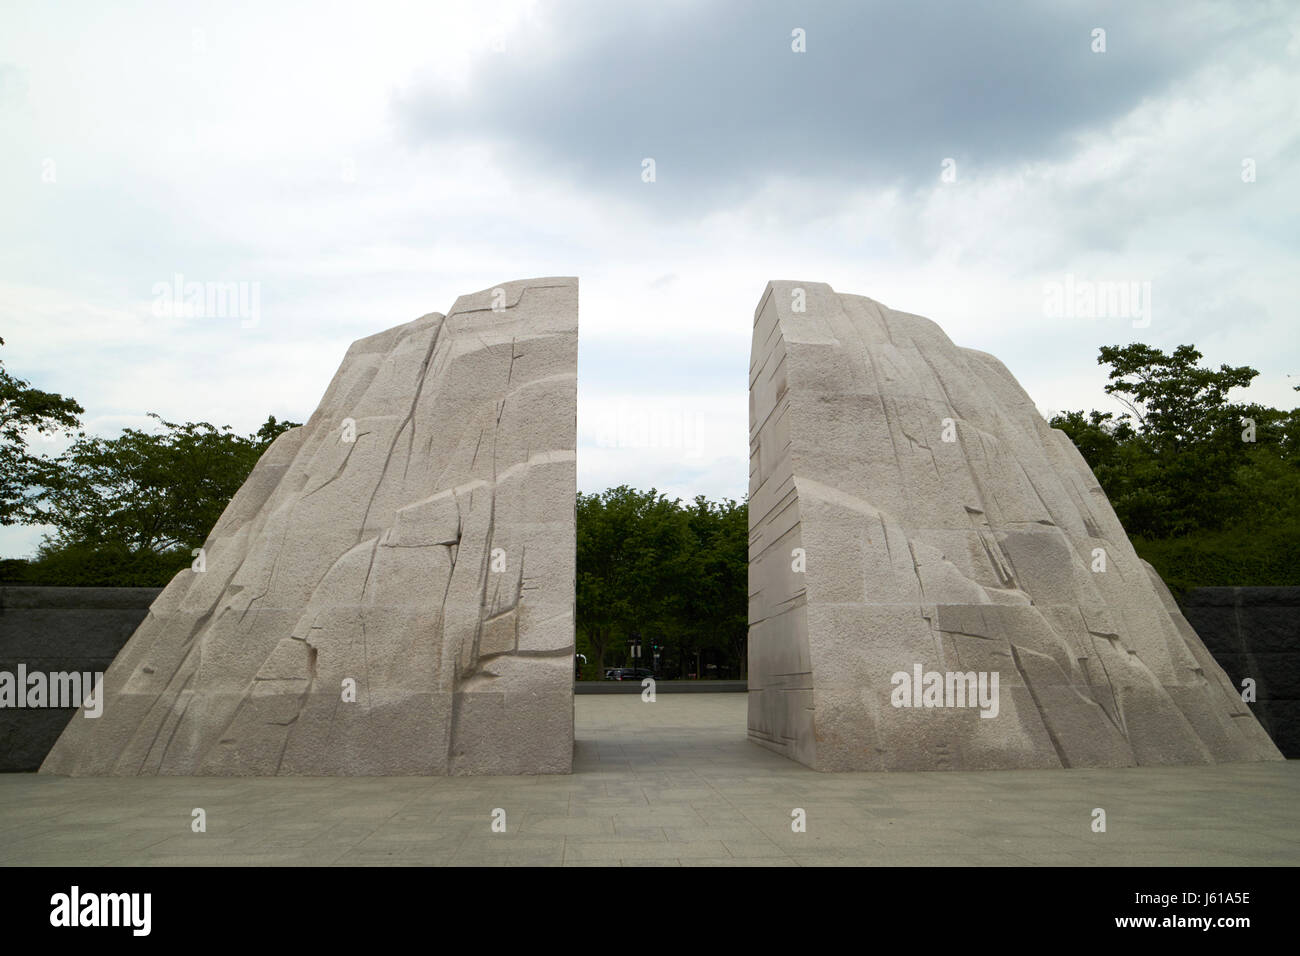 mountain of despair granite rock at Martin Luther King Jnr memorial Washington DC USA - Stock Image